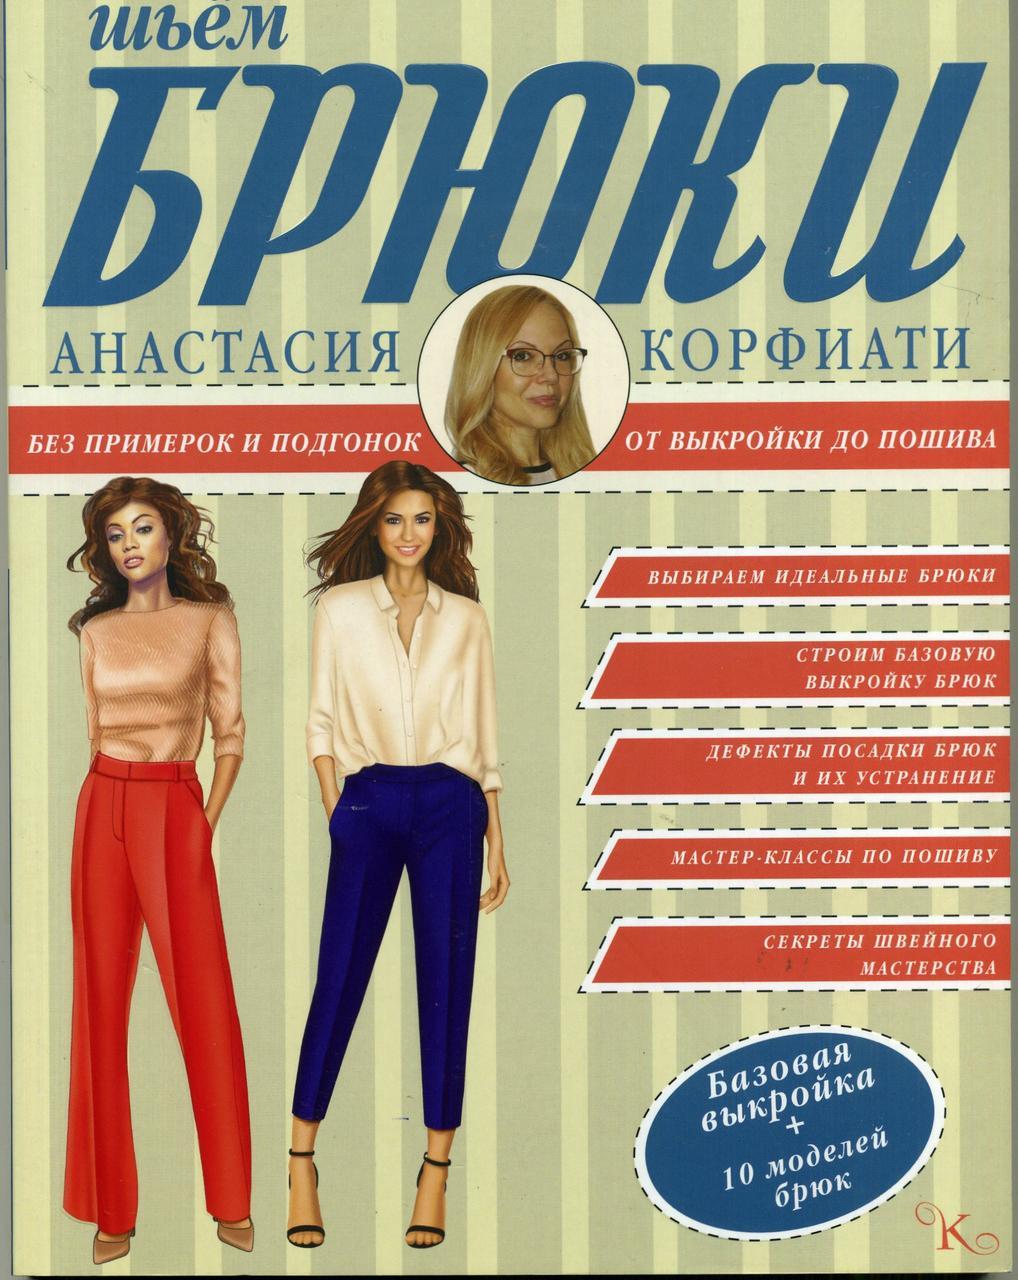 "Анастасия Корфиати ""Шьем брюки без примерок и подгонок"""